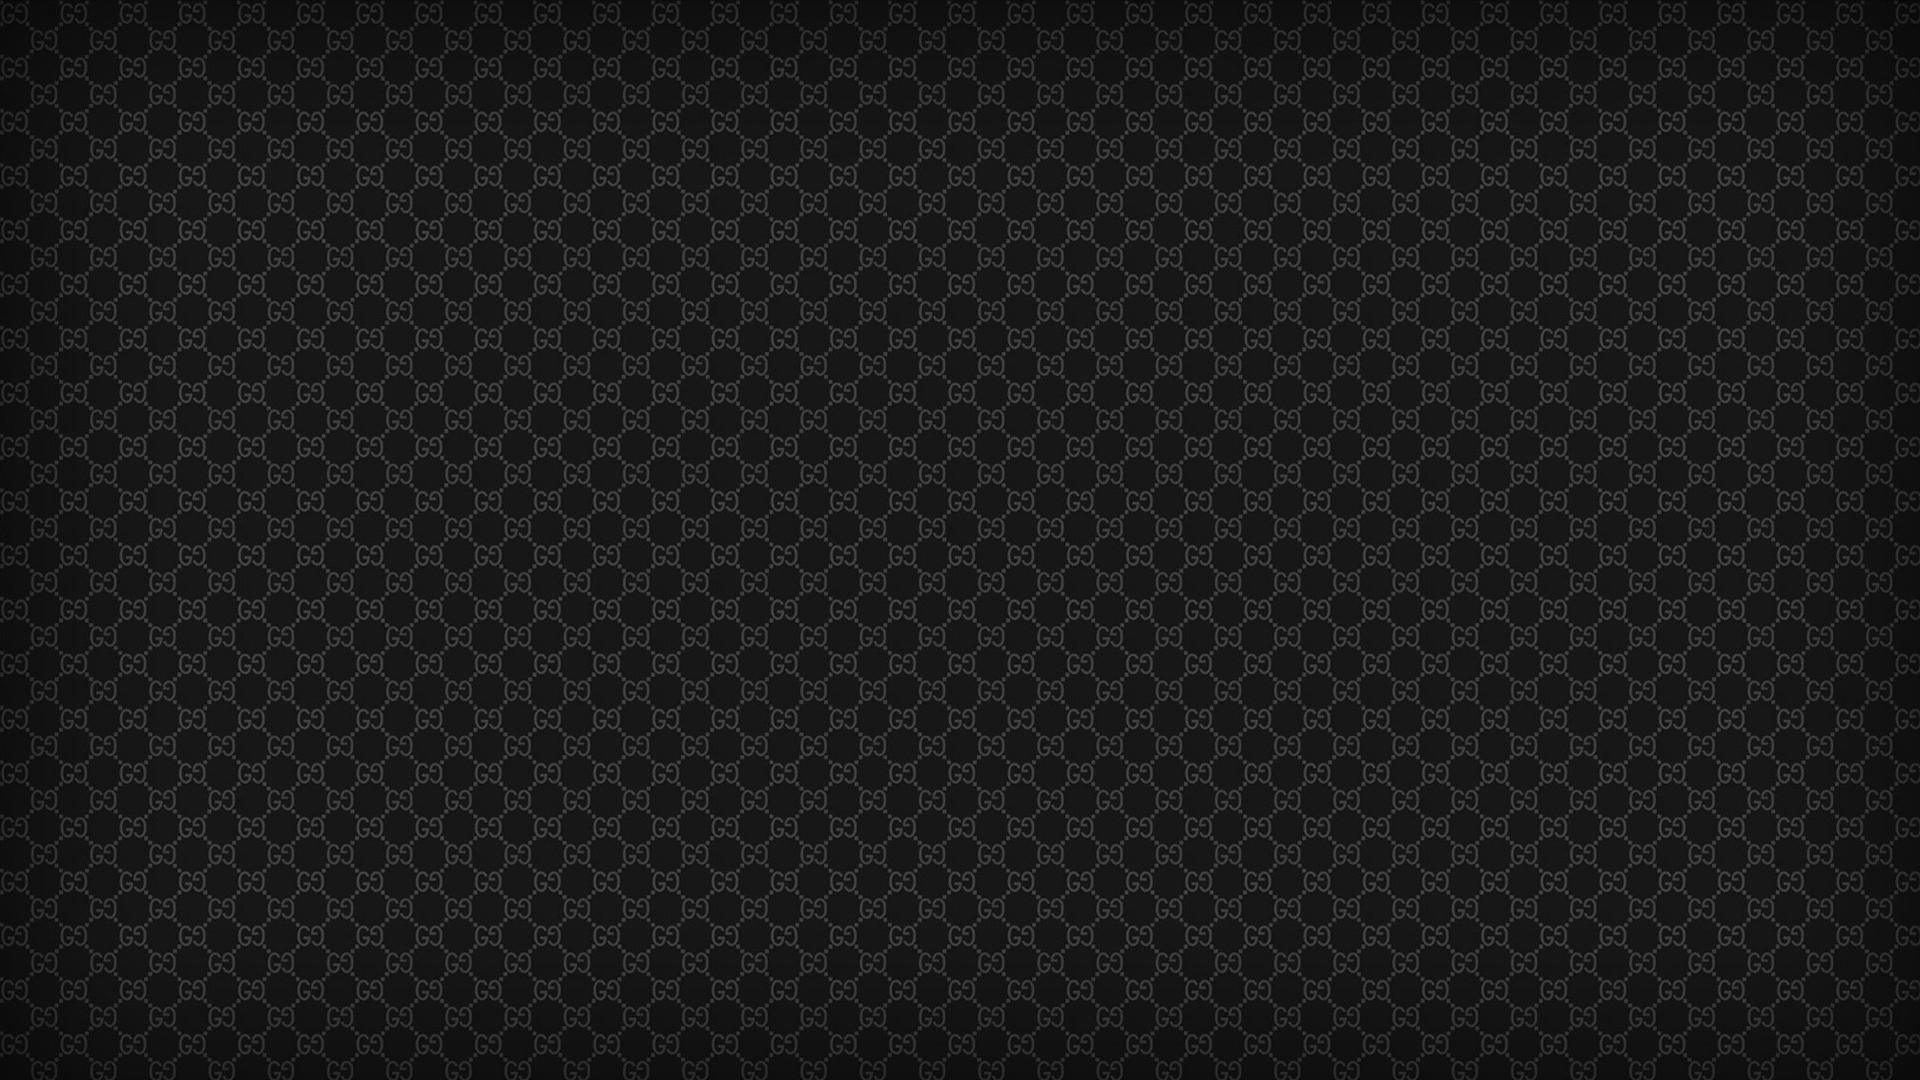 Black patterns textures gucci designer label wallpaper 429 1920x1080